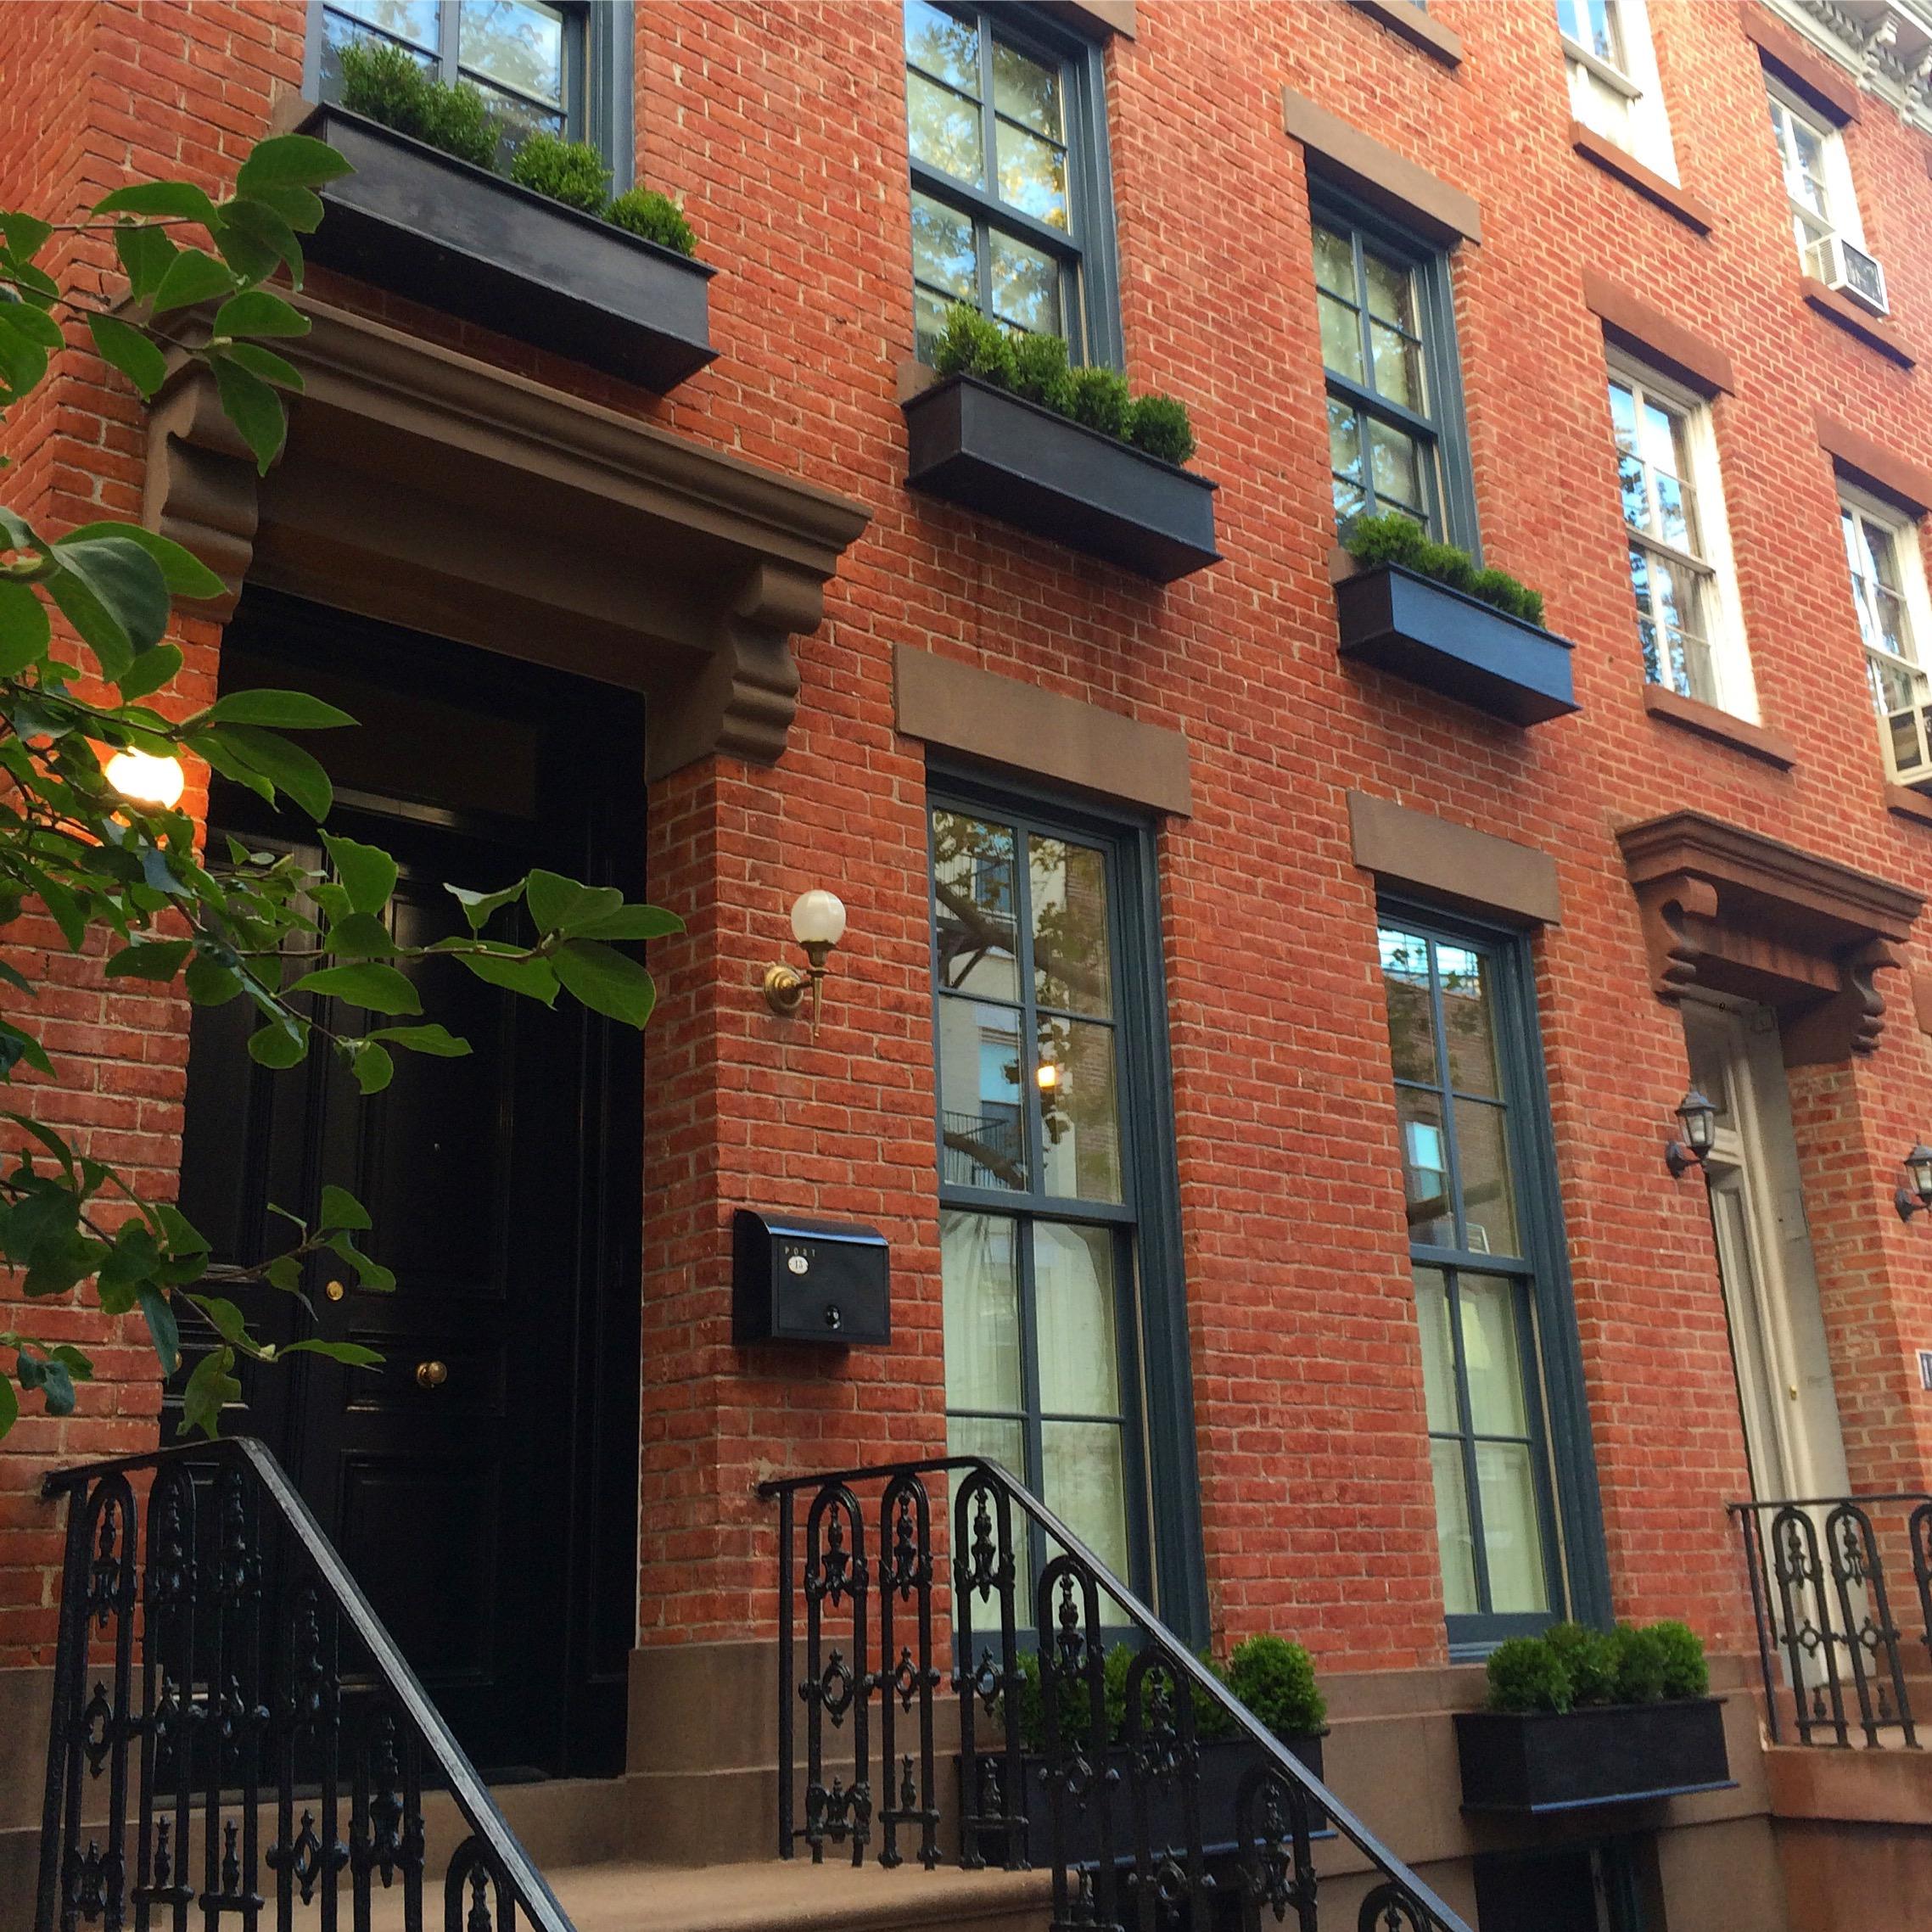 Brooklyn window boxes